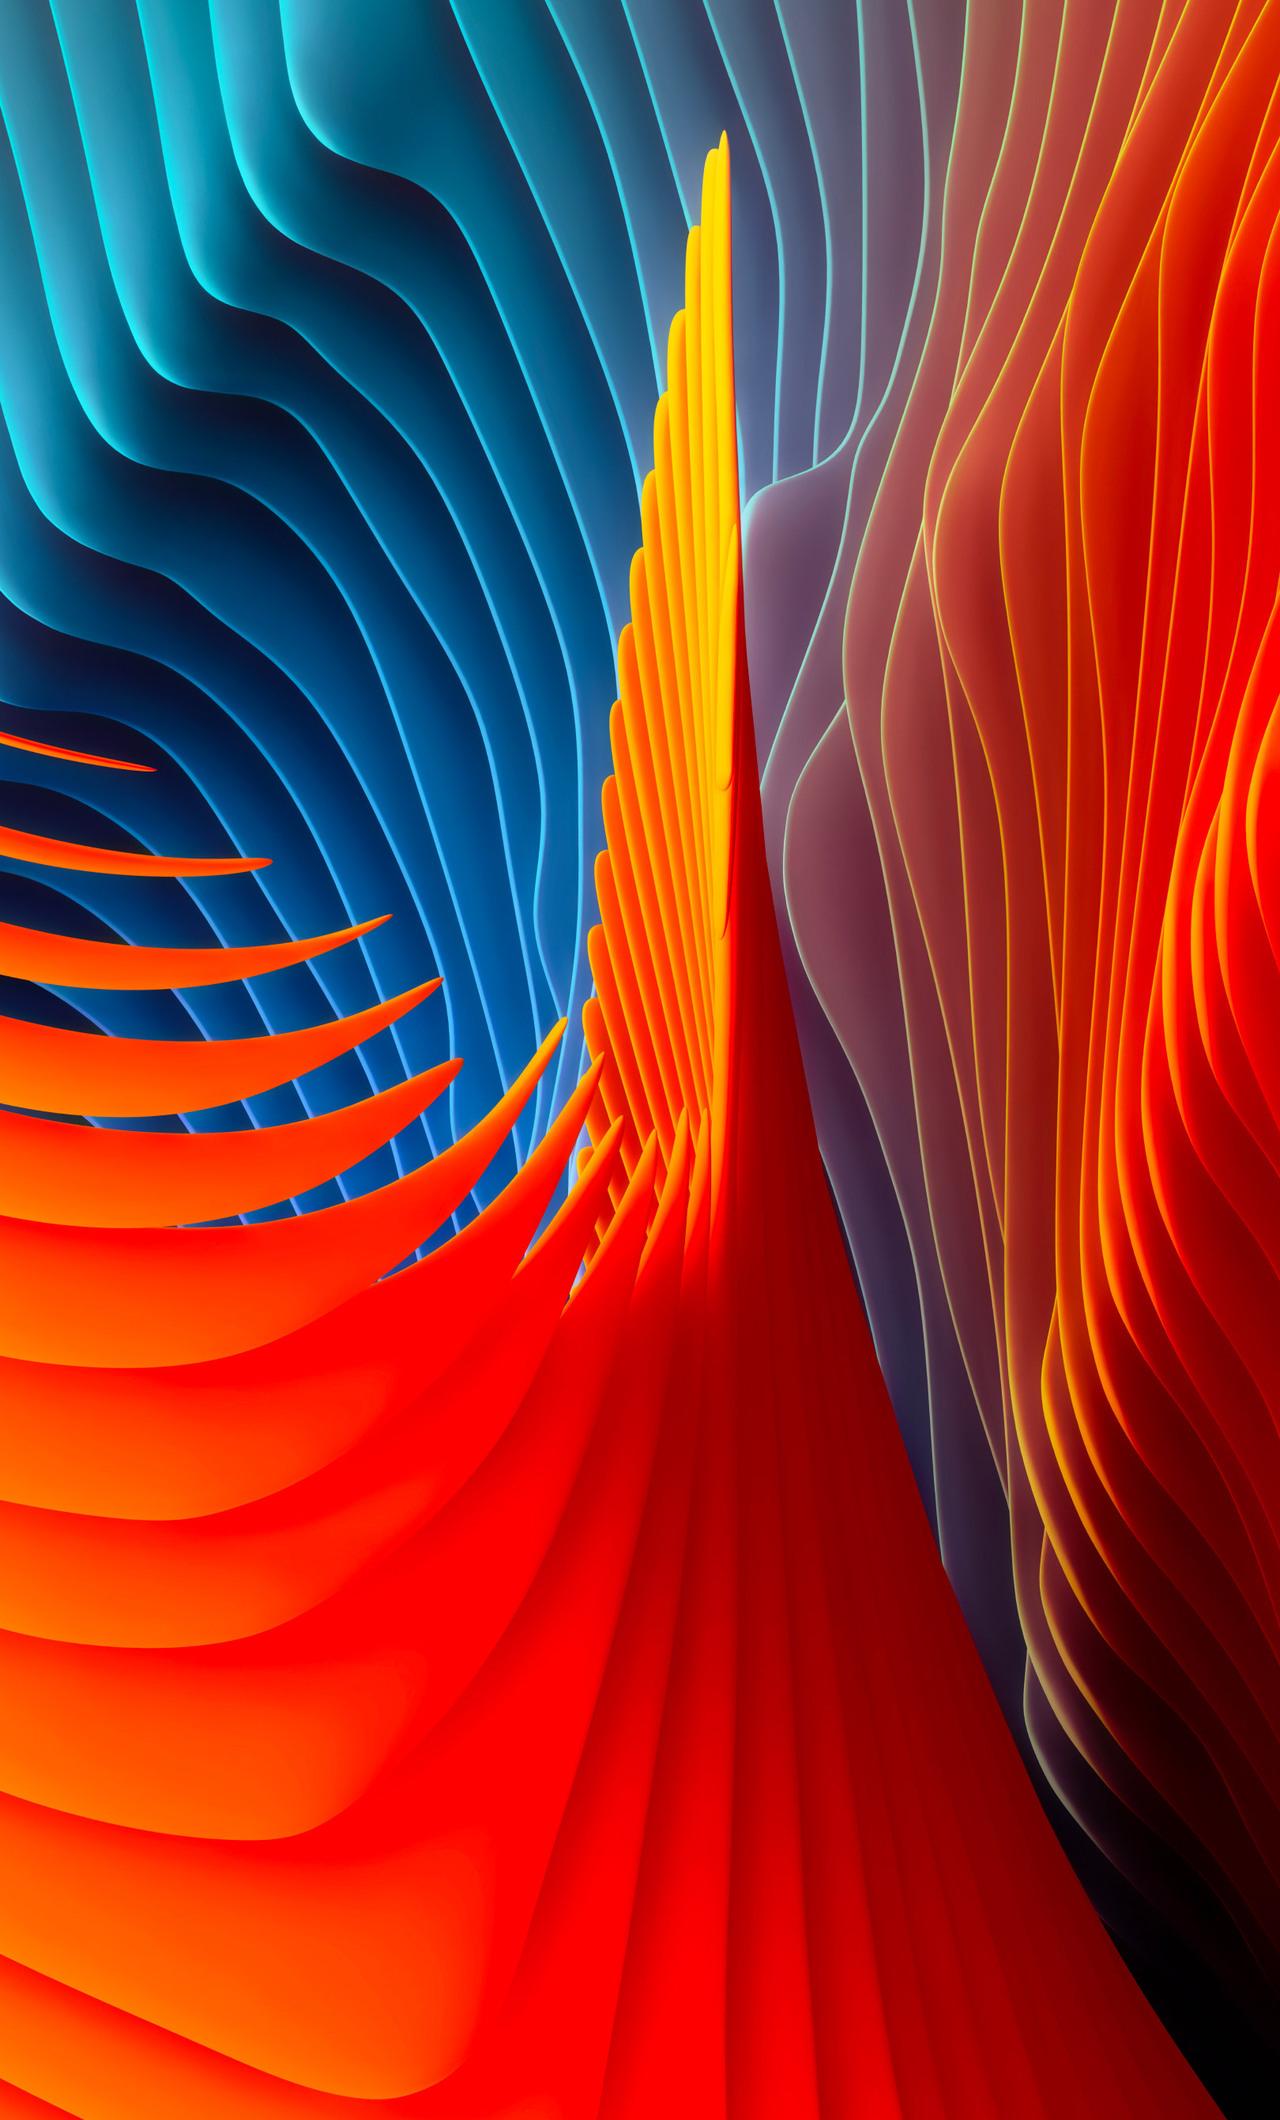 1280x2120 mac os sierra abstract shapes iphone 6 hd 4k